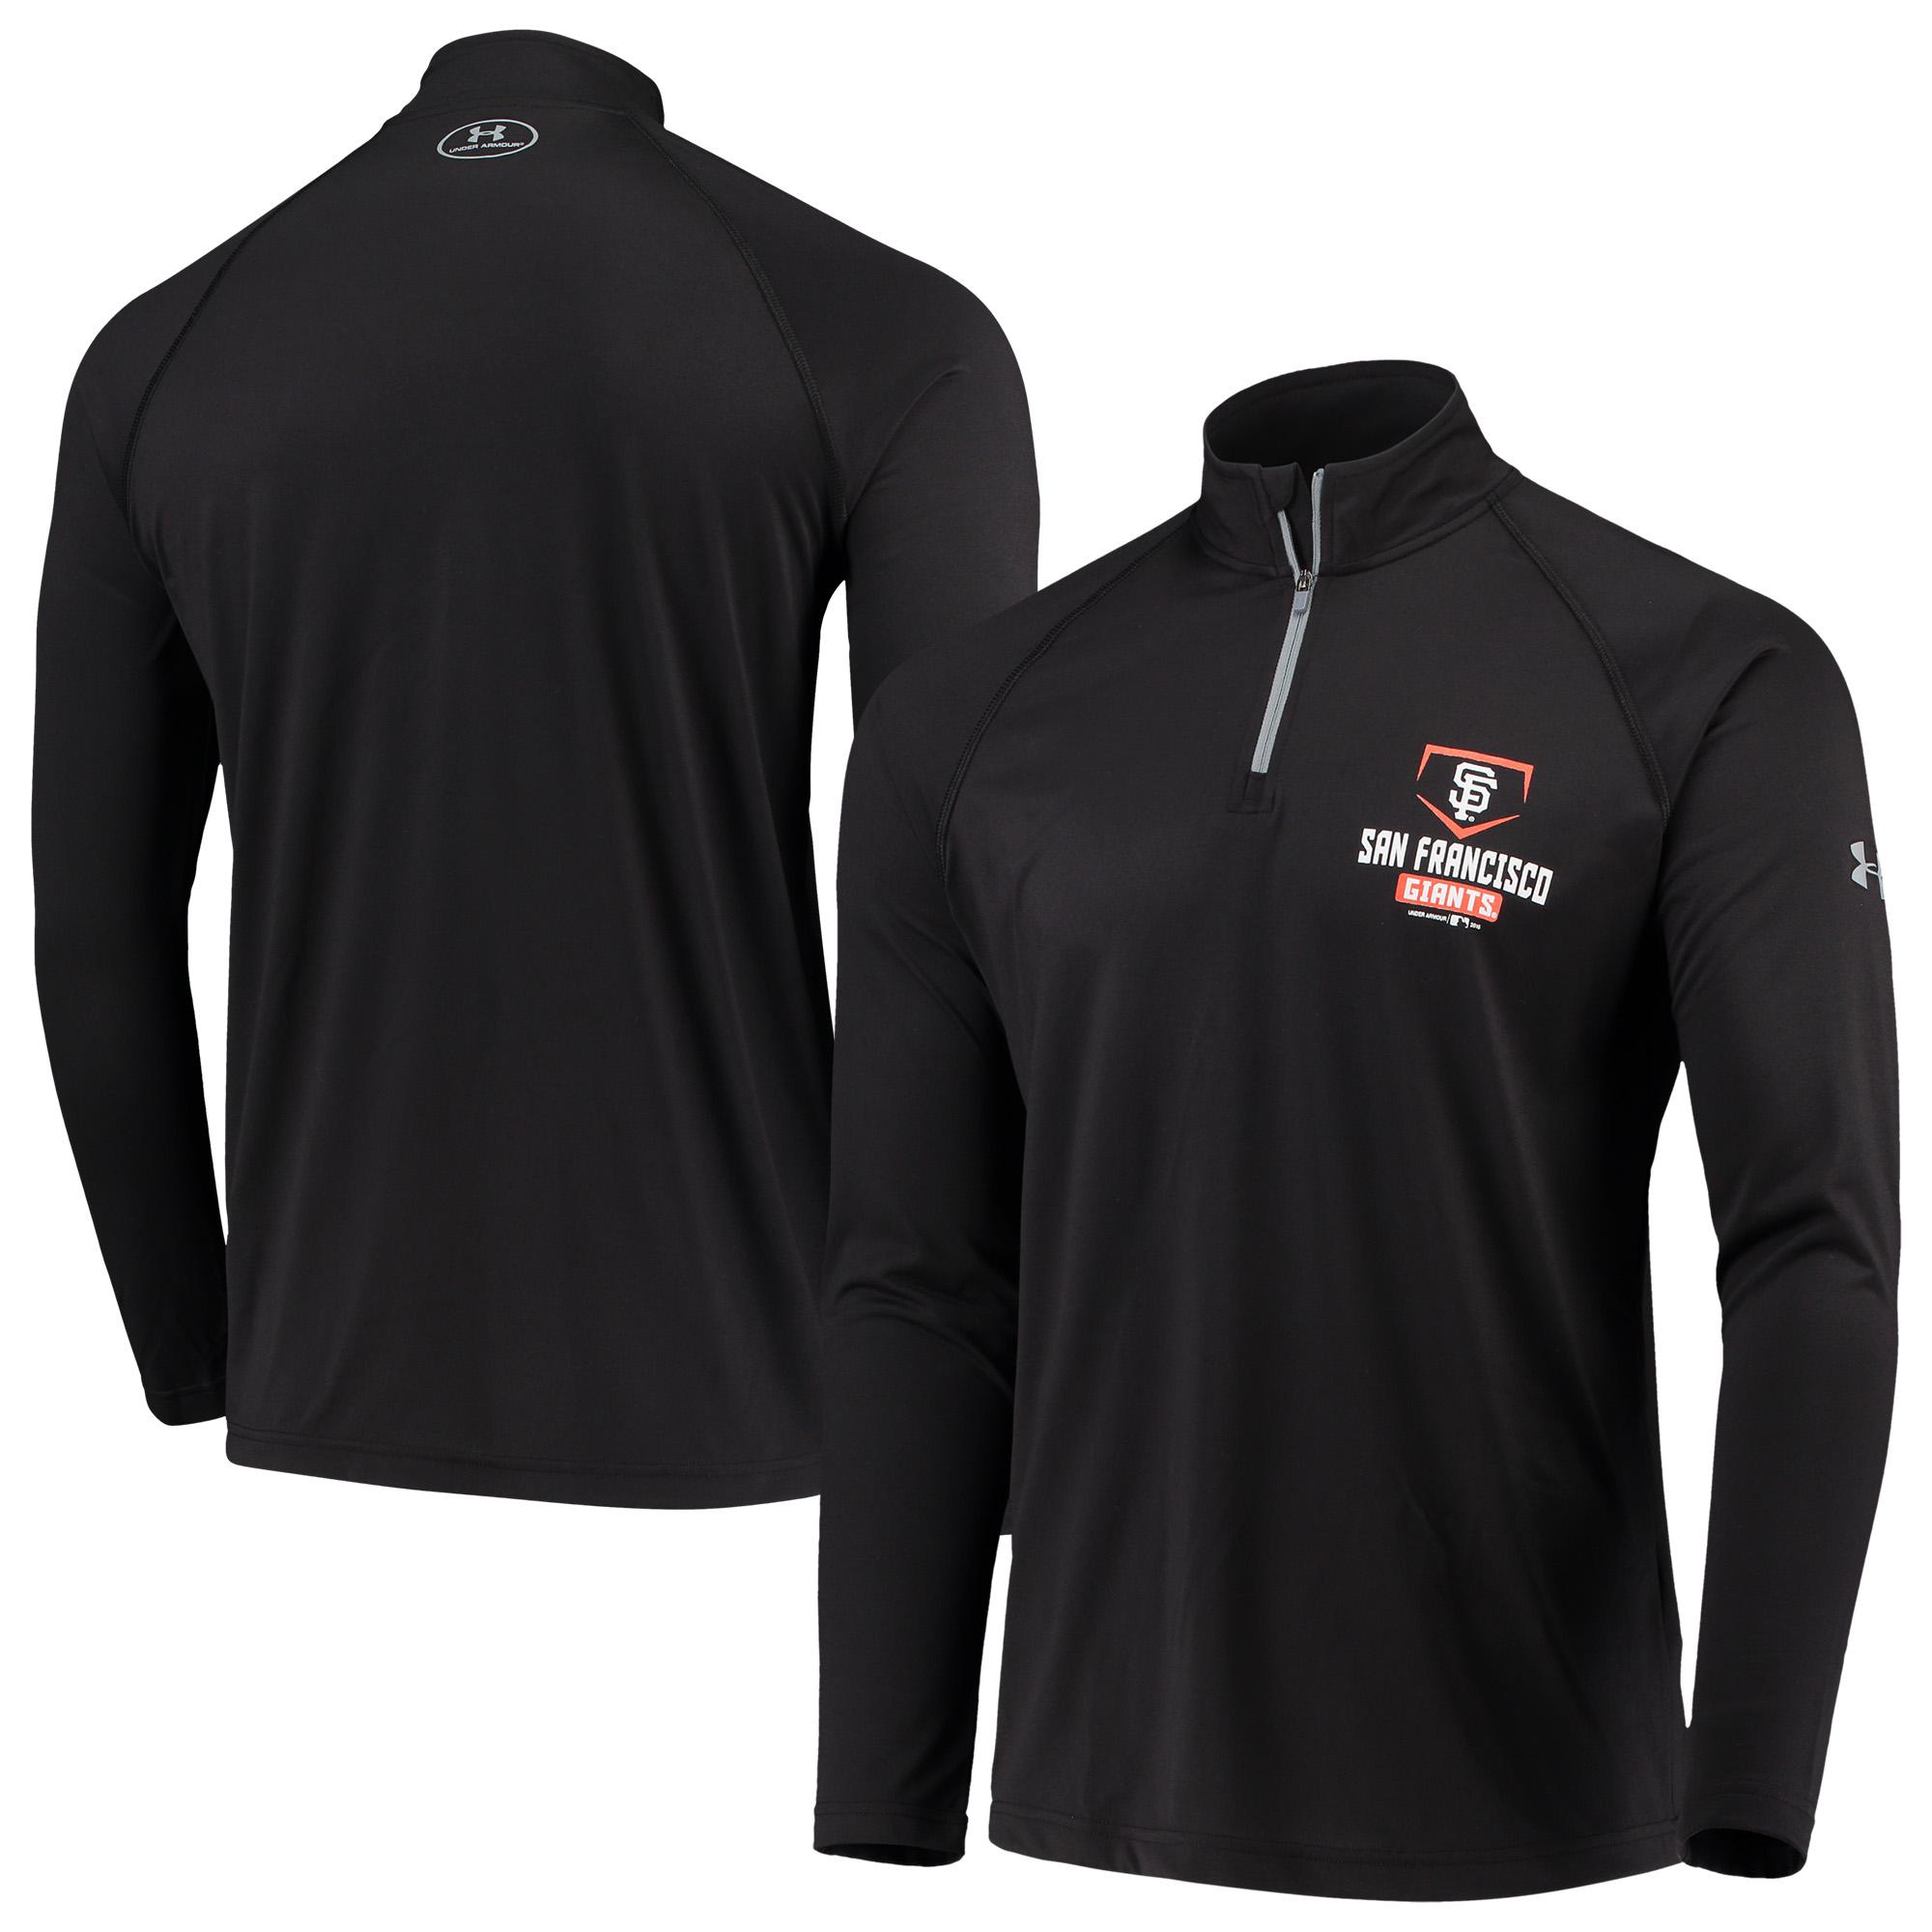 San Francisco Giants Under Armour Tech Quarter-Zip Performance Pullover Jacket - Black